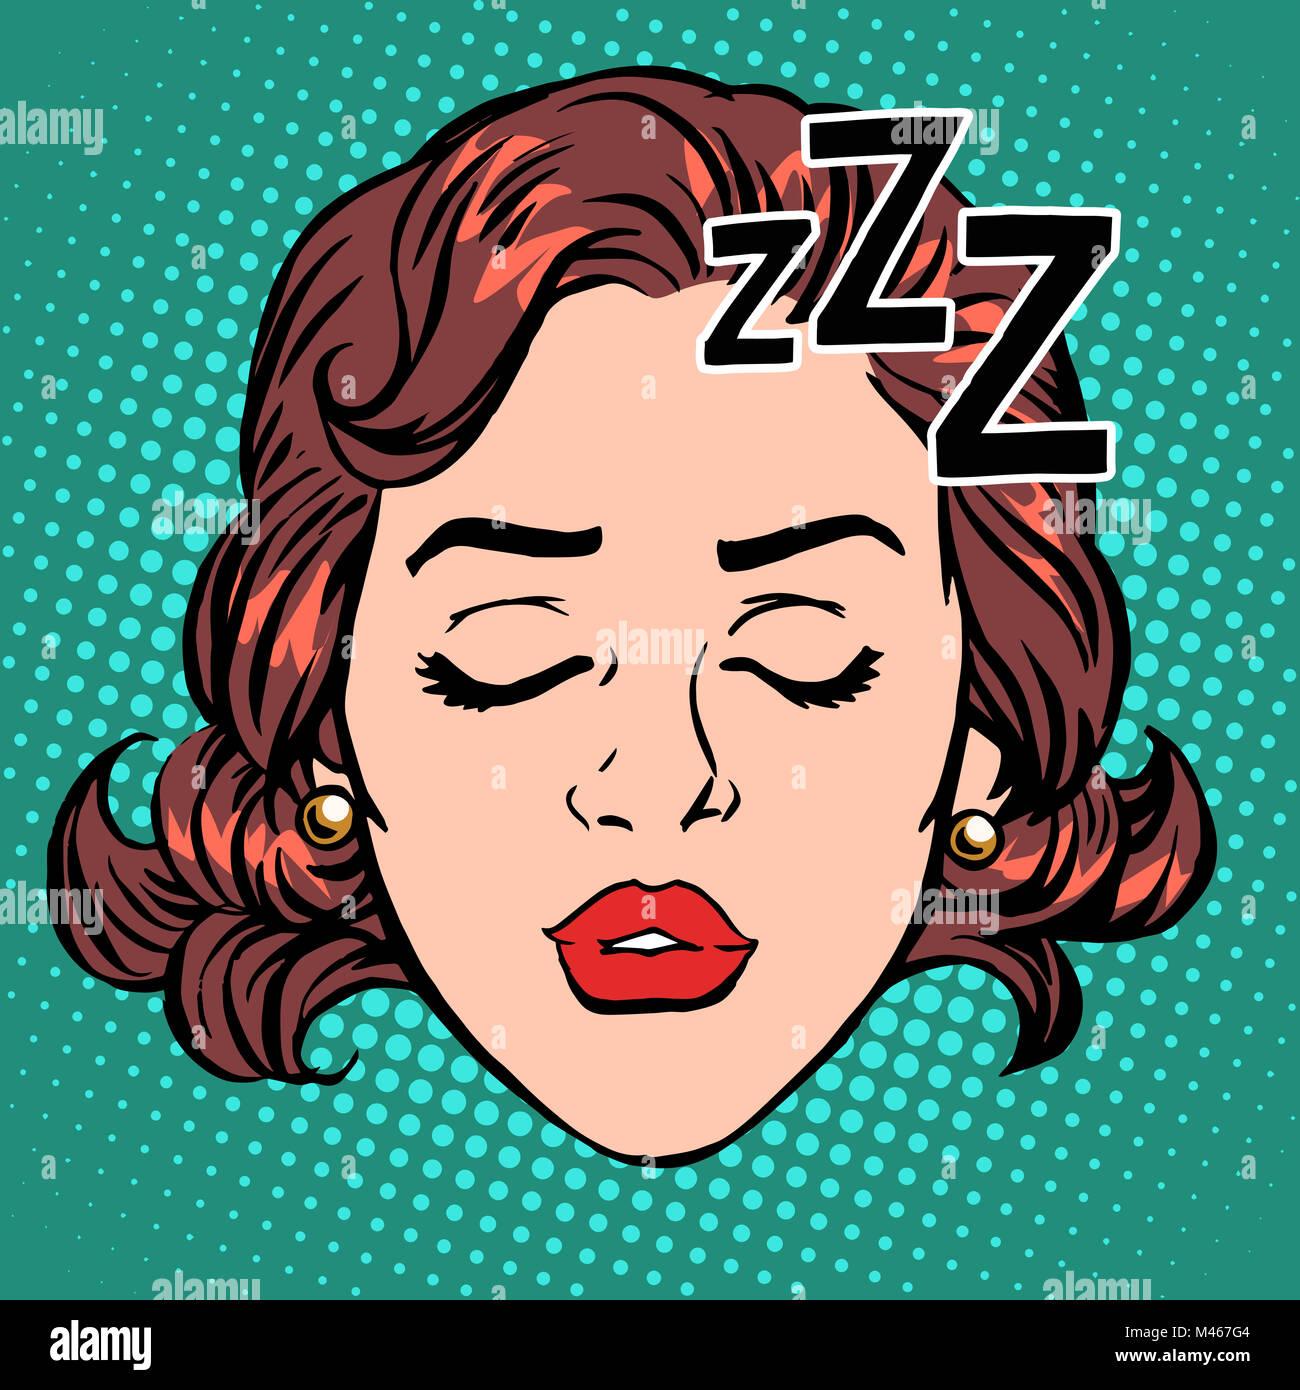 Emoji icon woman face sleep - Stock Image